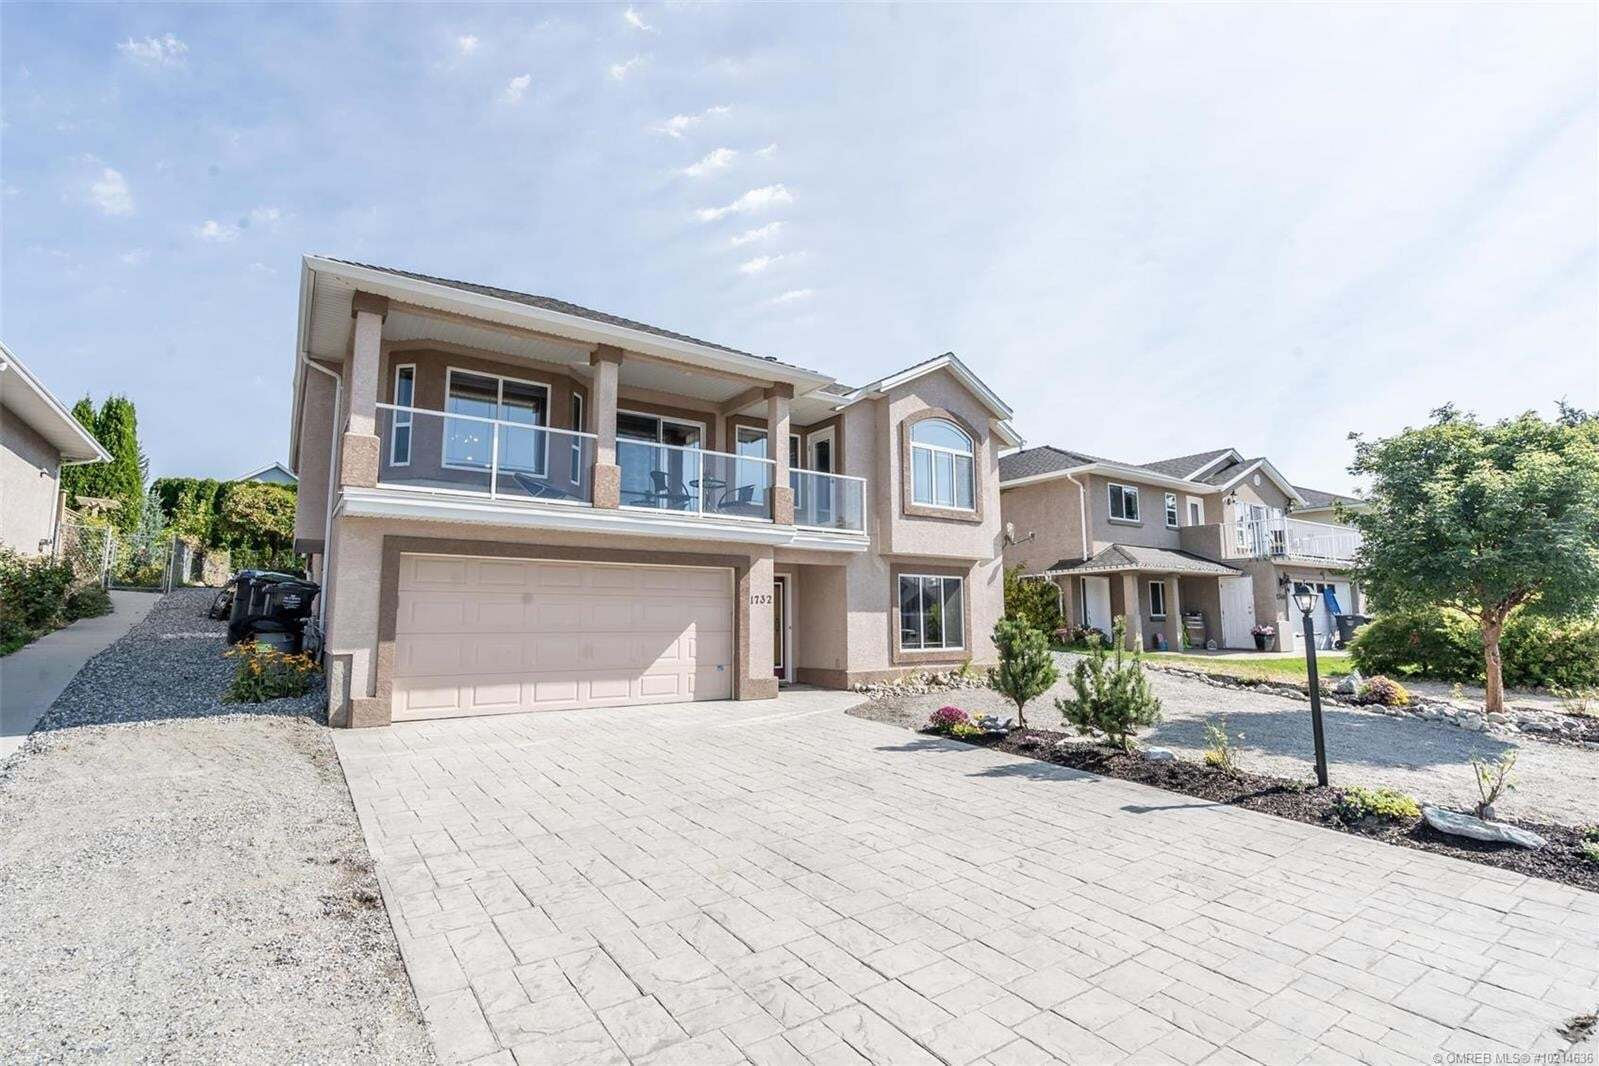 House for sale at 1732 Marona Ct Kelowna British Columbia - MLS: 10214636